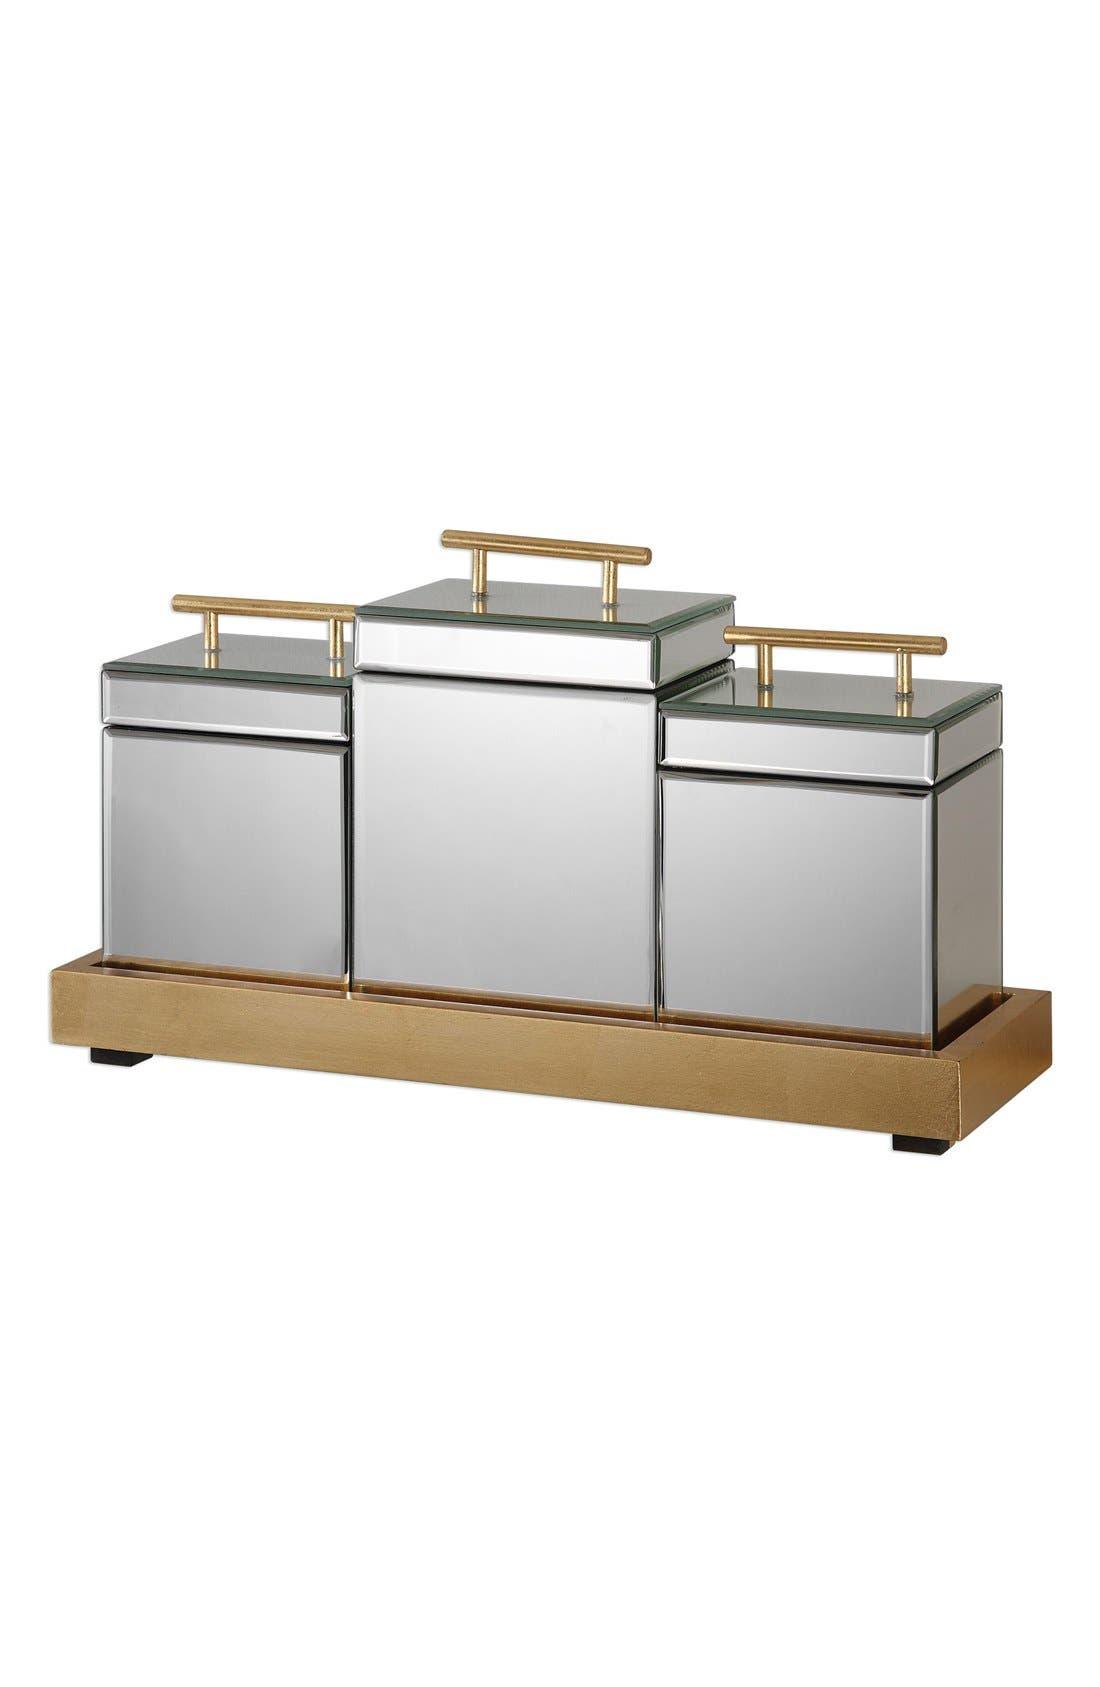 4-Piece Trinket Box & Tray Set,                             Main thumbnail 1, color,                             Metallic Gold